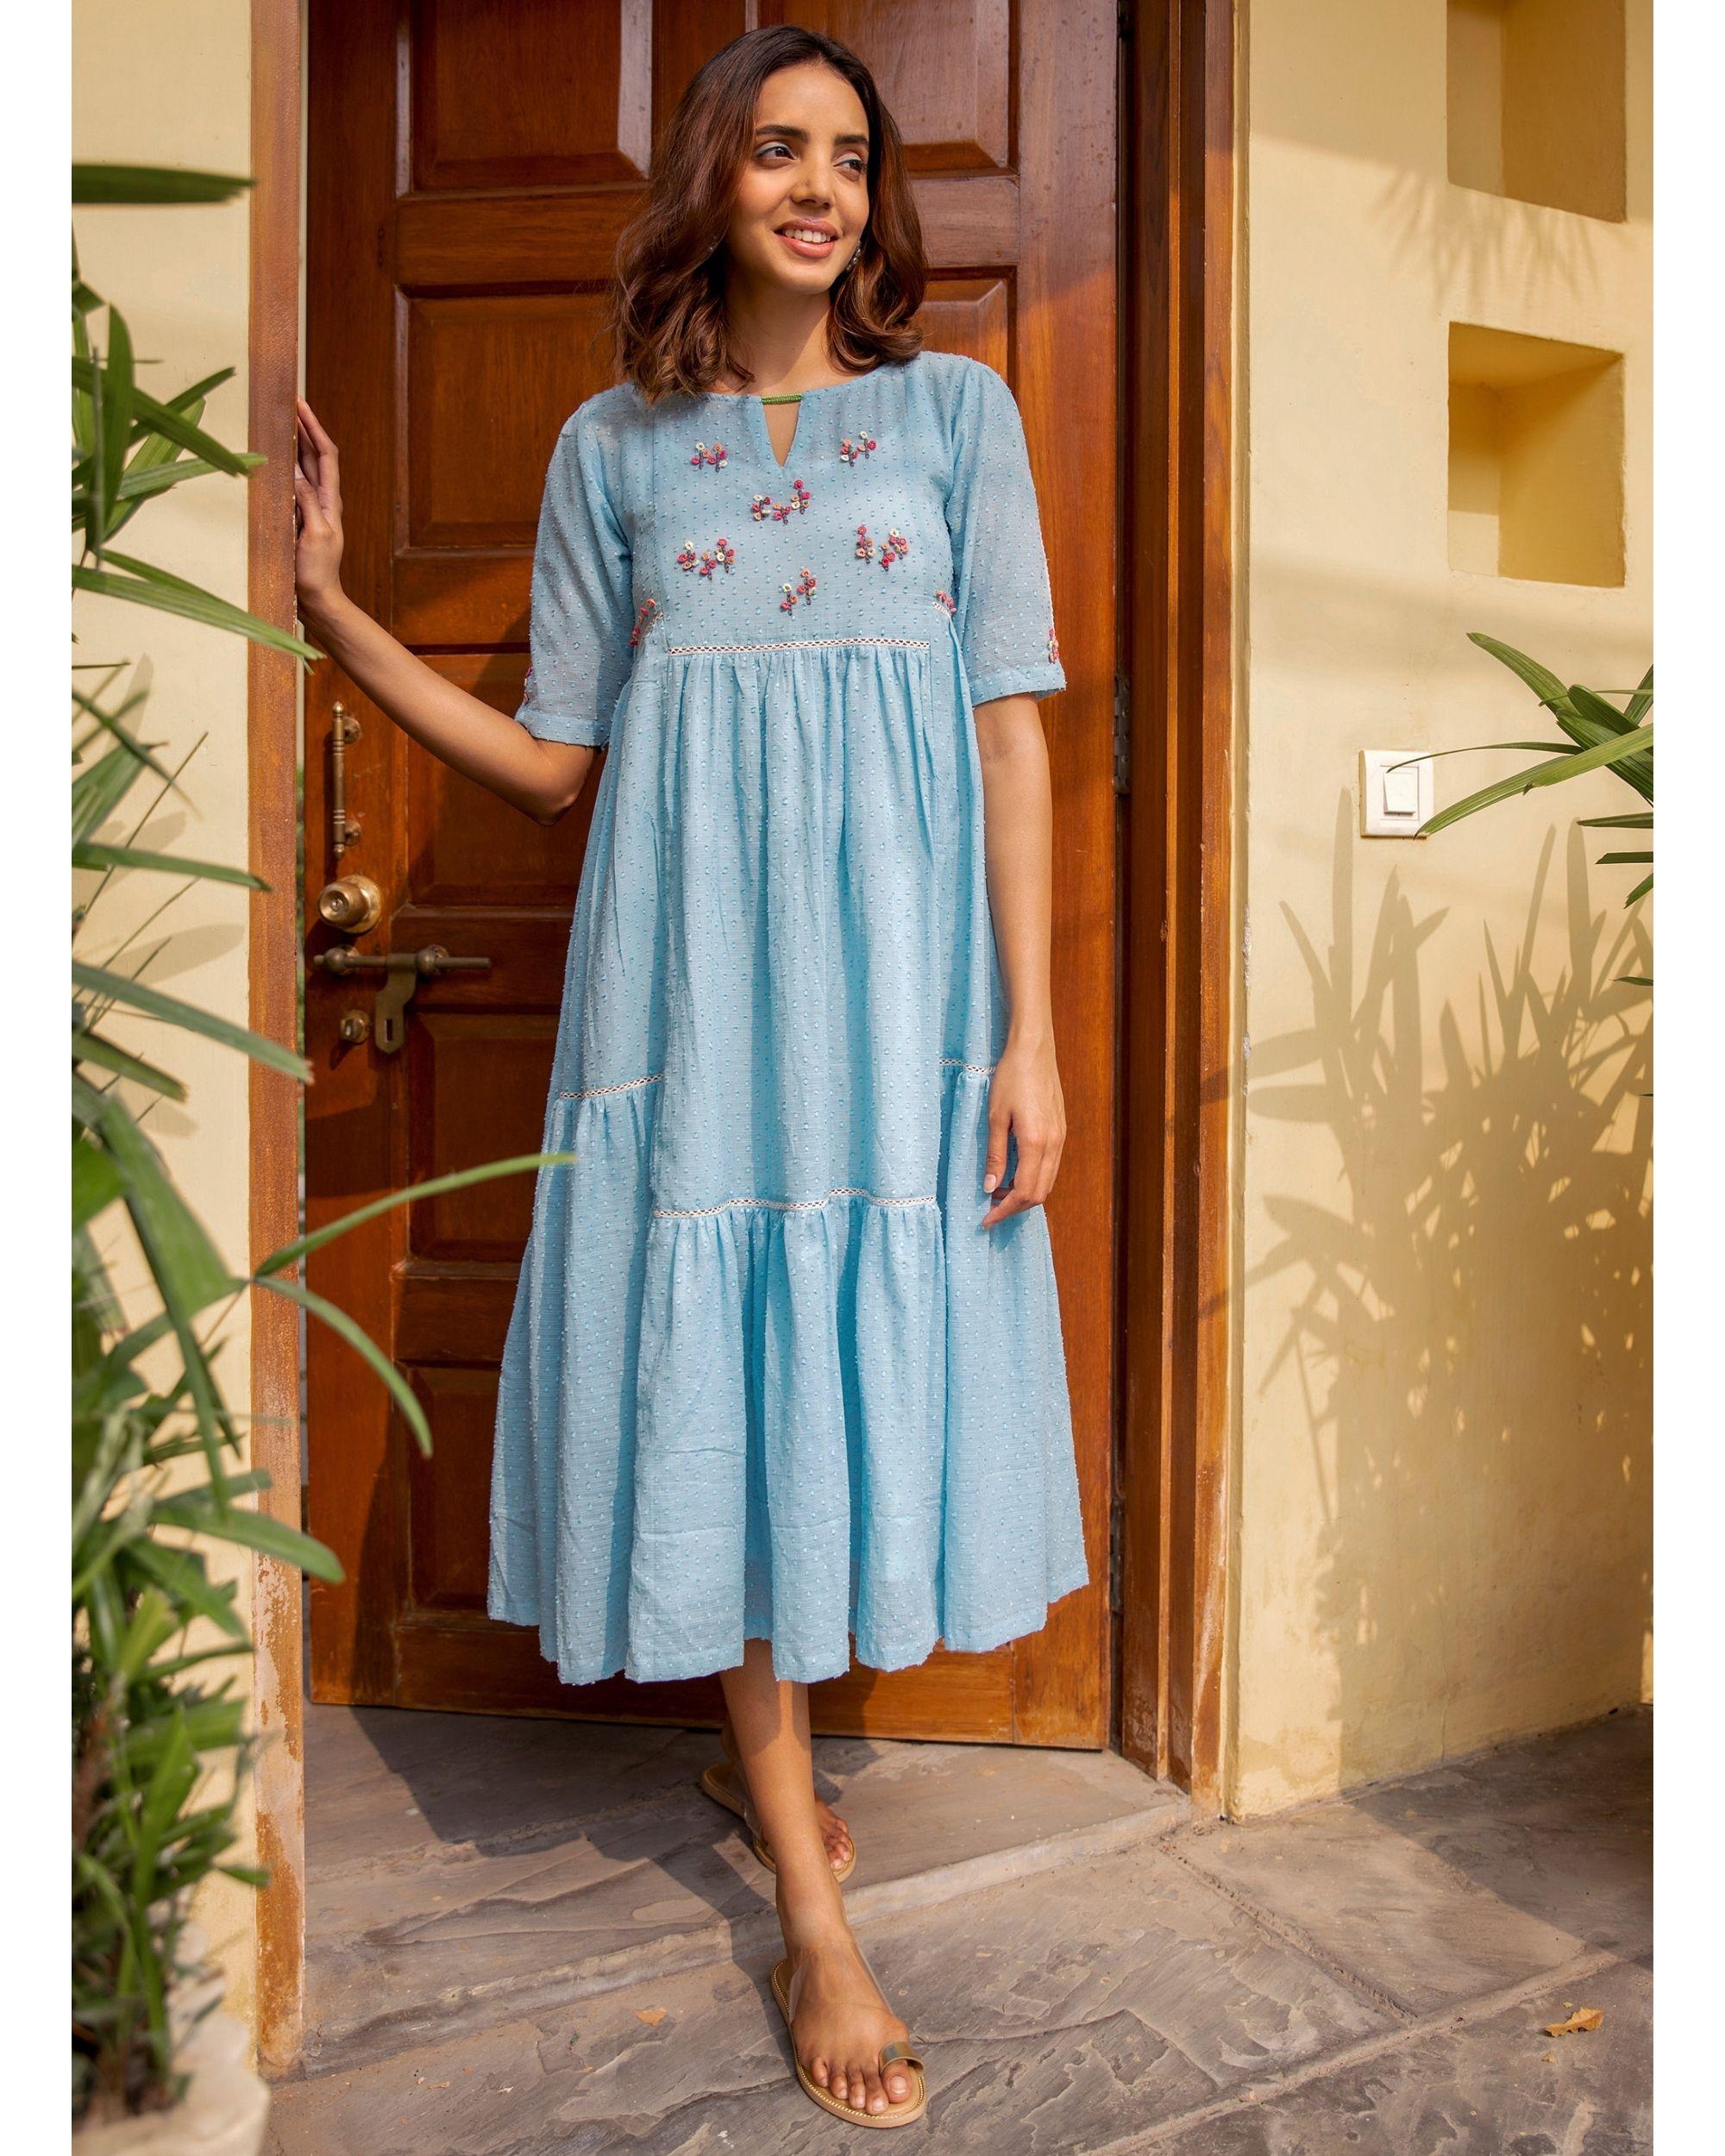 Blue poppy dress